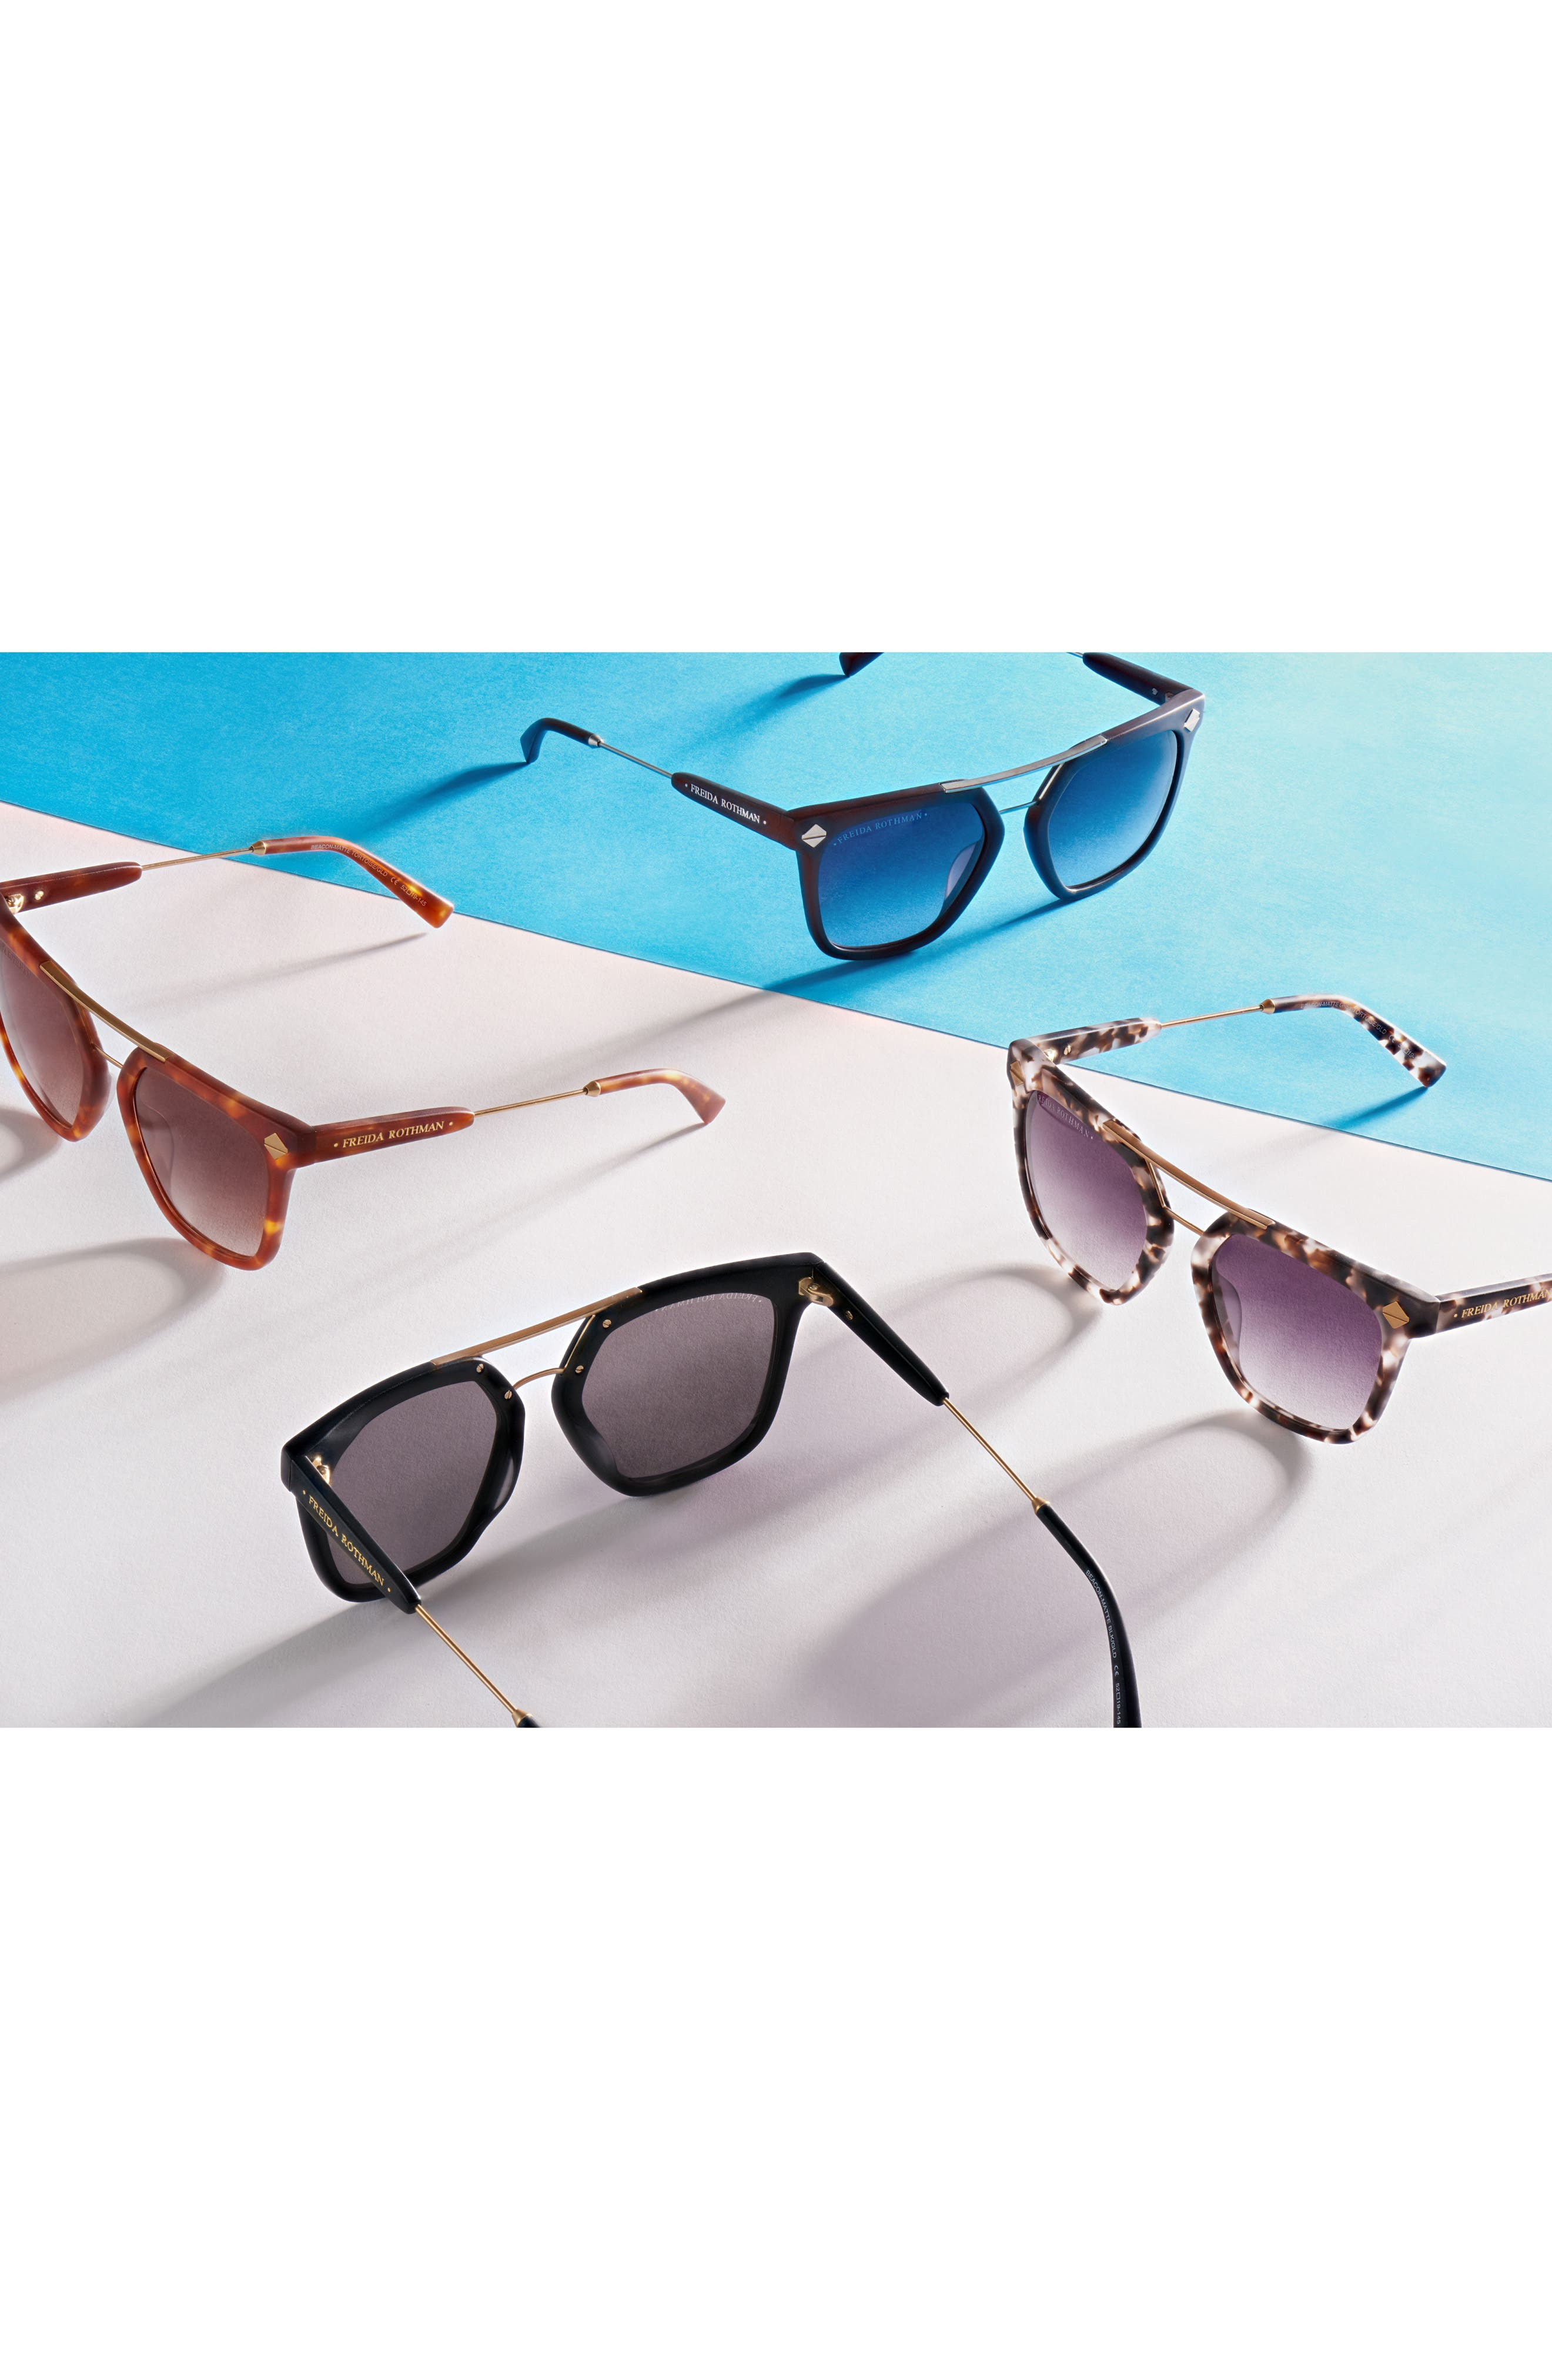 Beacon 52mm Aviator Sunglasses,                             Alternate thumbnail 2, color,                             Black